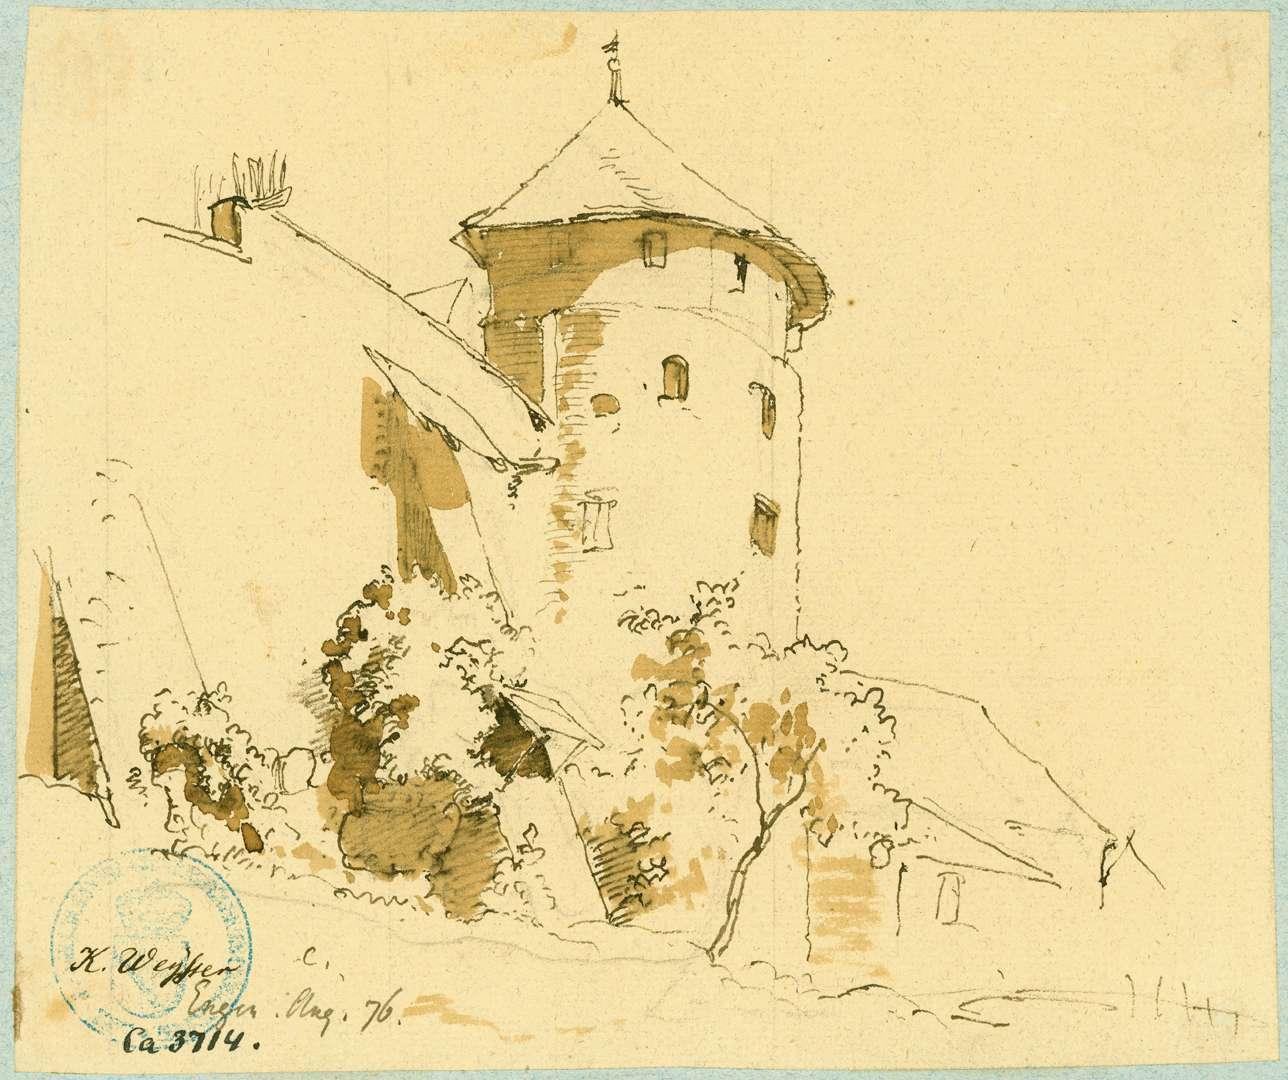 Engen Stadtmauer mit Wehrturm beim Krenkinger Schloss, Bild 1